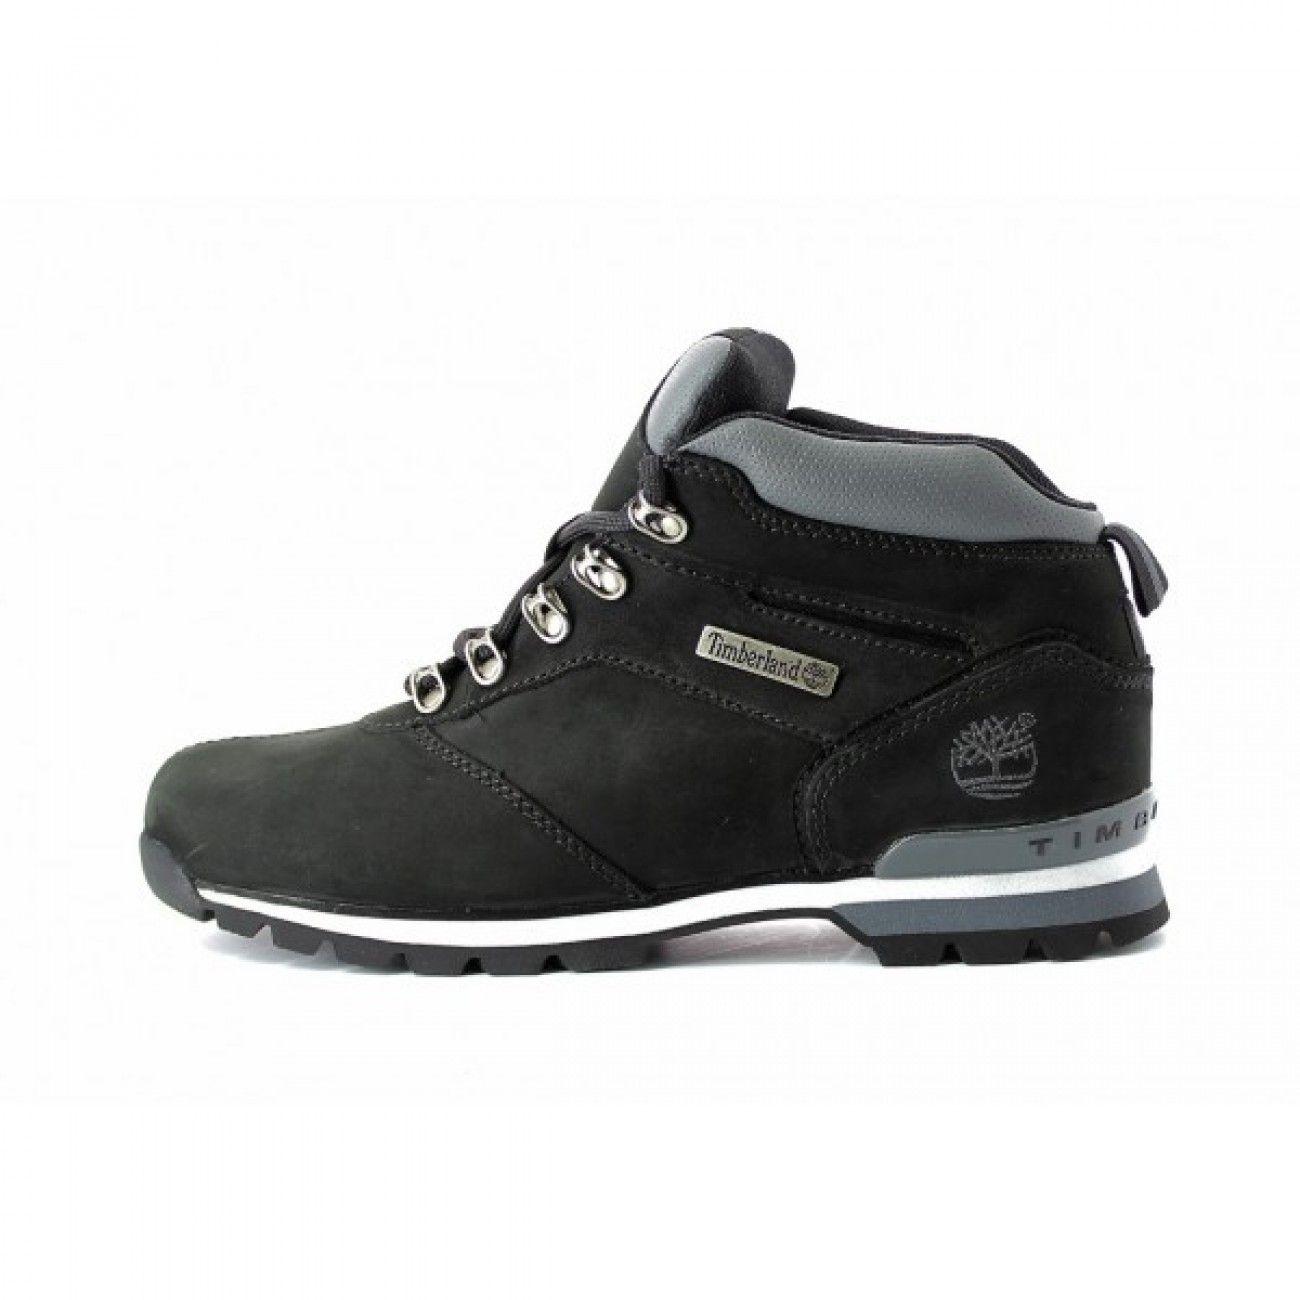 timberland splitrock chaussures hommes